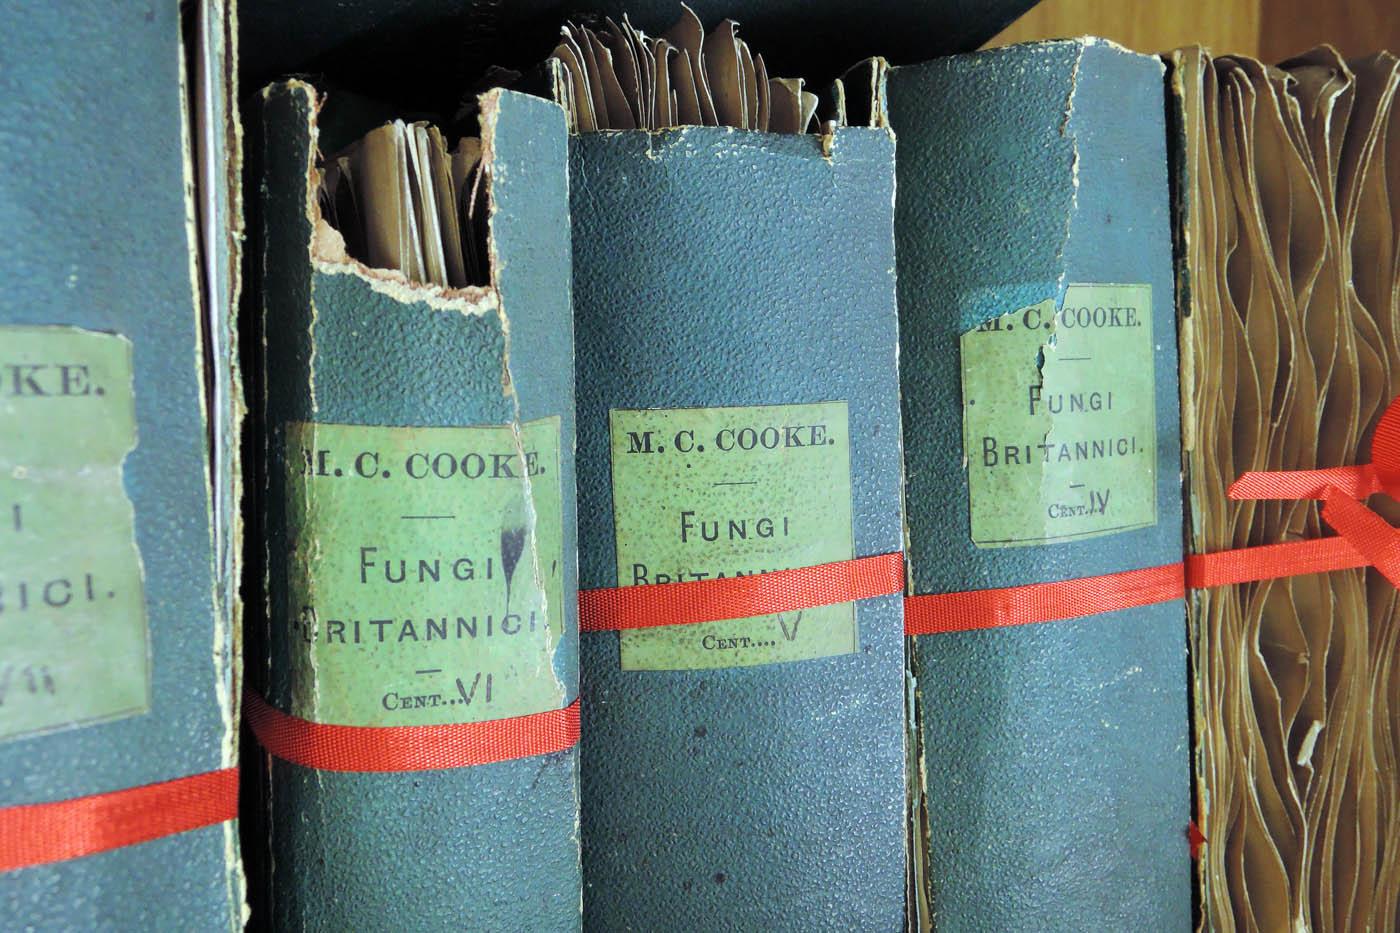 Kew books